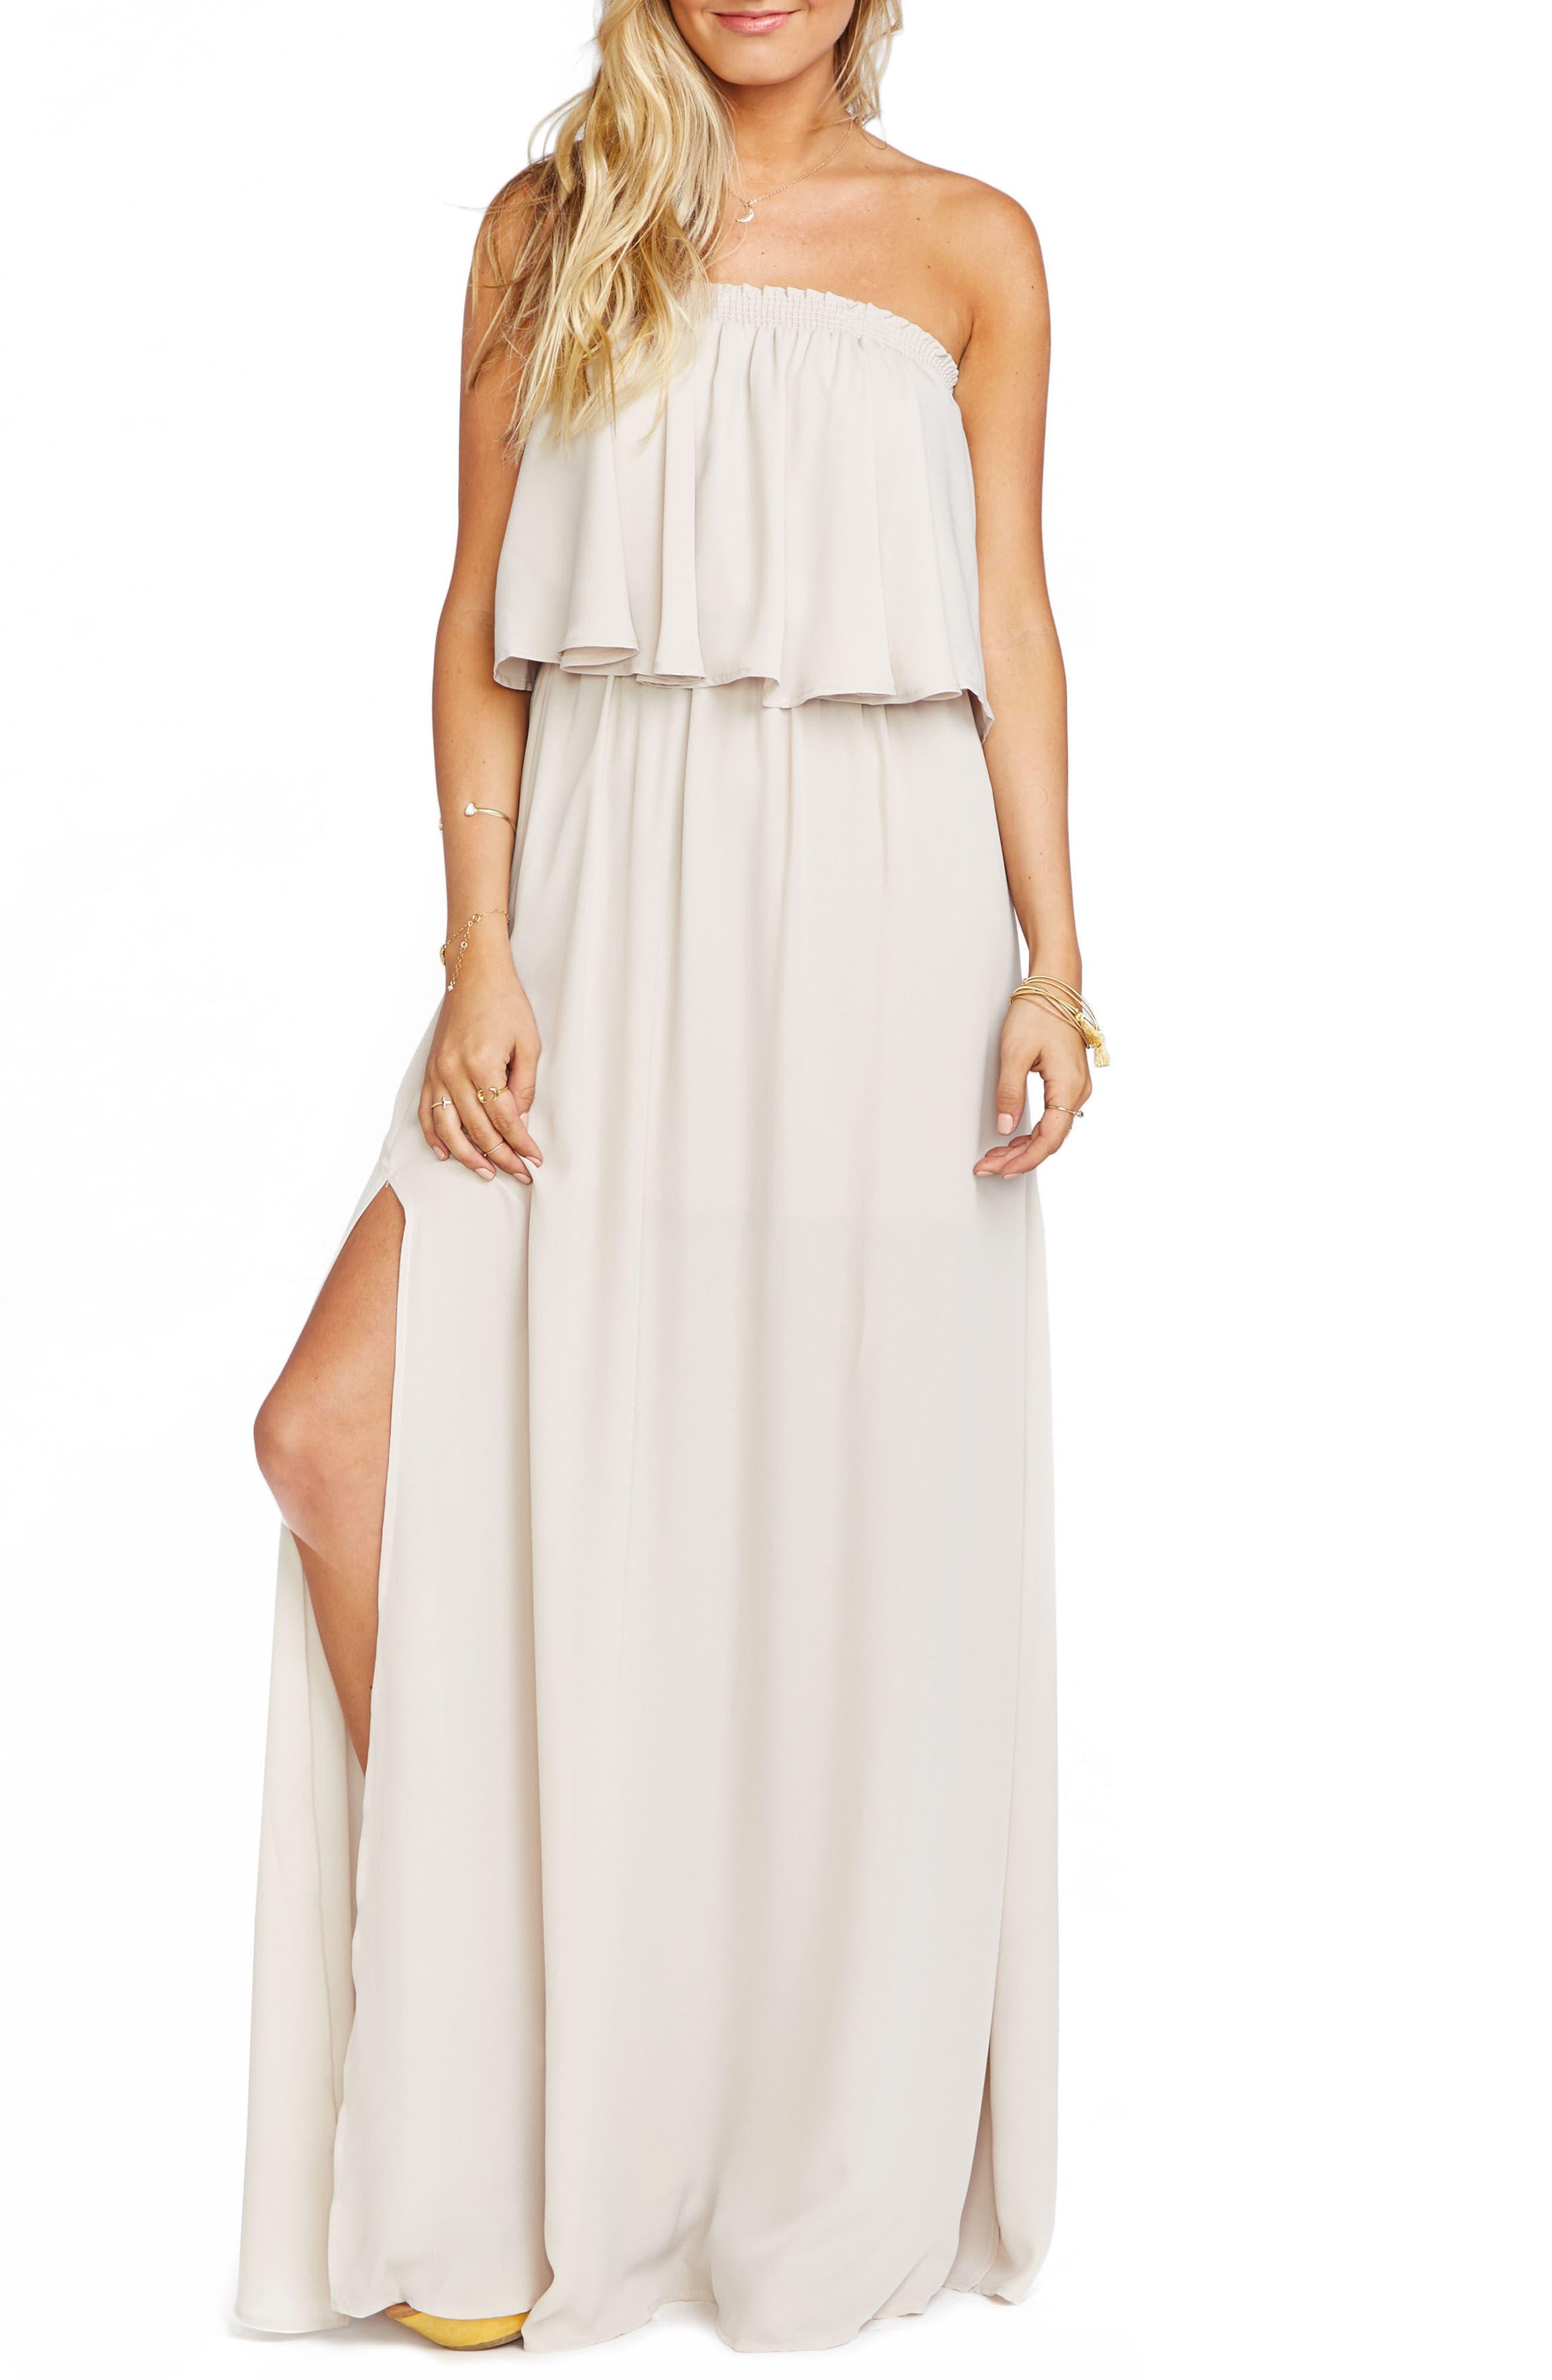 Hacienda Convertible Gown,                         Main,                         color, SHOW ME THE RING CRISP